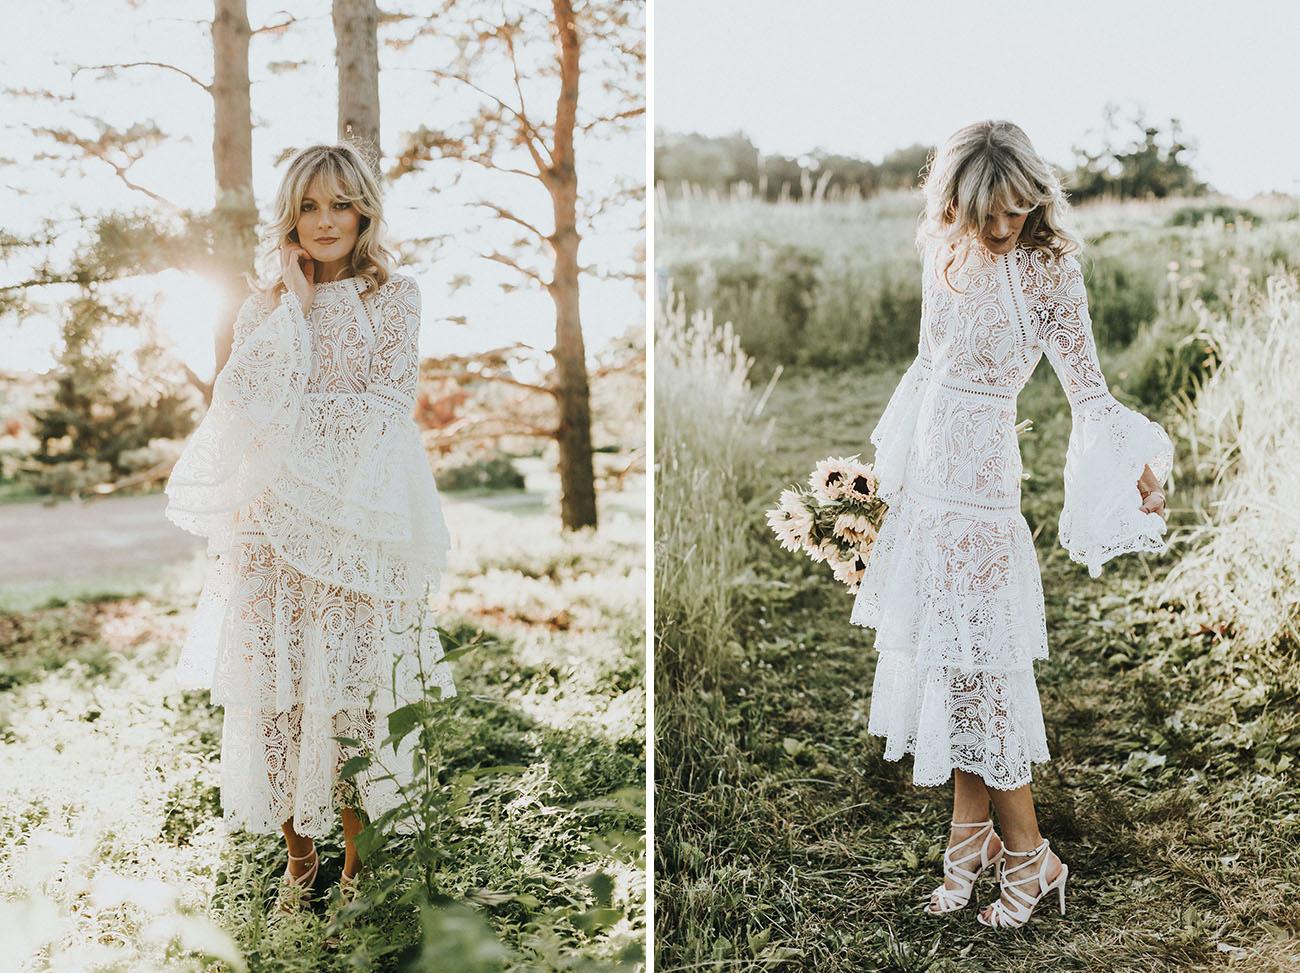 Dreamy Summer Lace Dress Inspiration